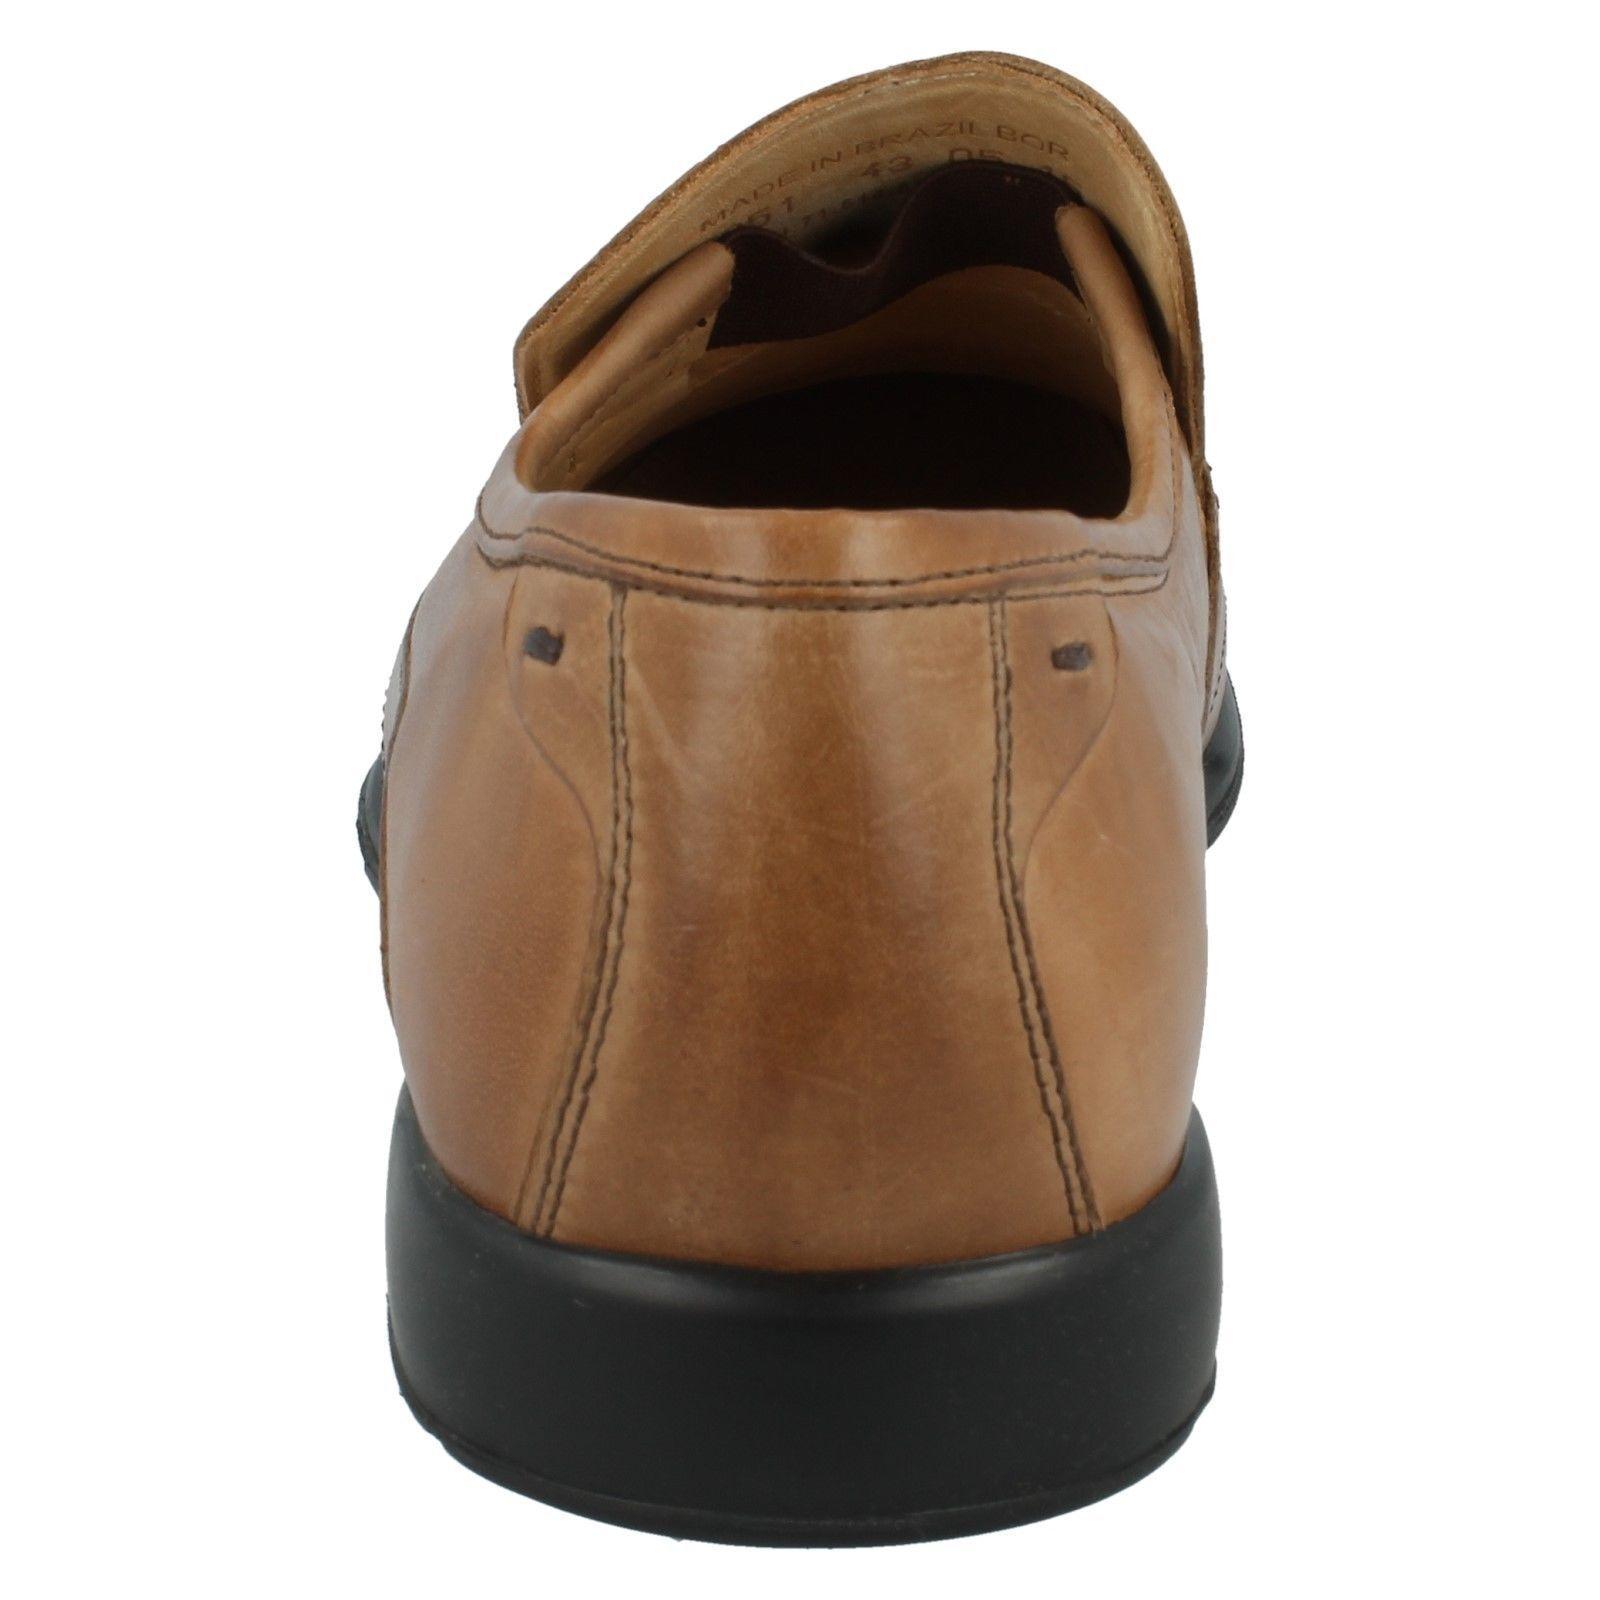 SALE Herren anatomic&co schwarz / Schuhe hellbraun Leder Slip On Schuhe / PETROPOLIS 420b43